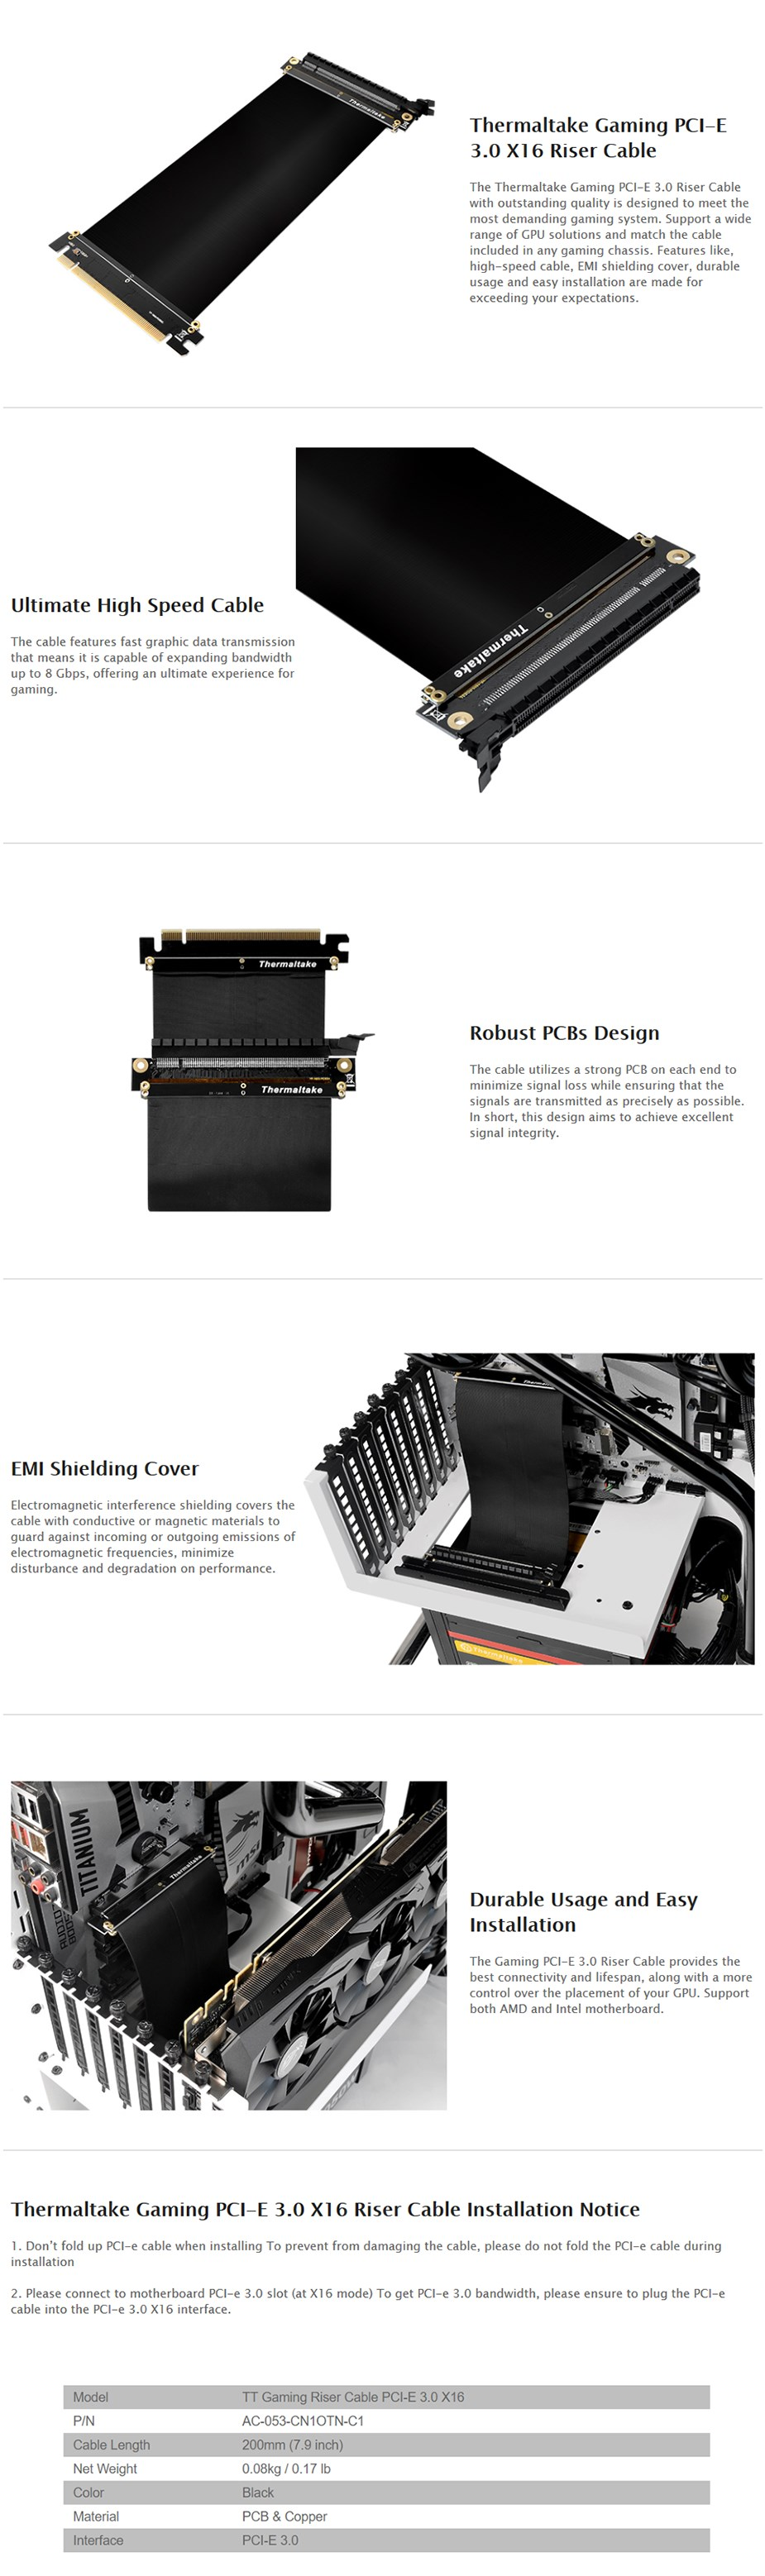 Thermaltake Core P5 PCI-Express x16 3.0 Riser Cable - Desktop Overview 1